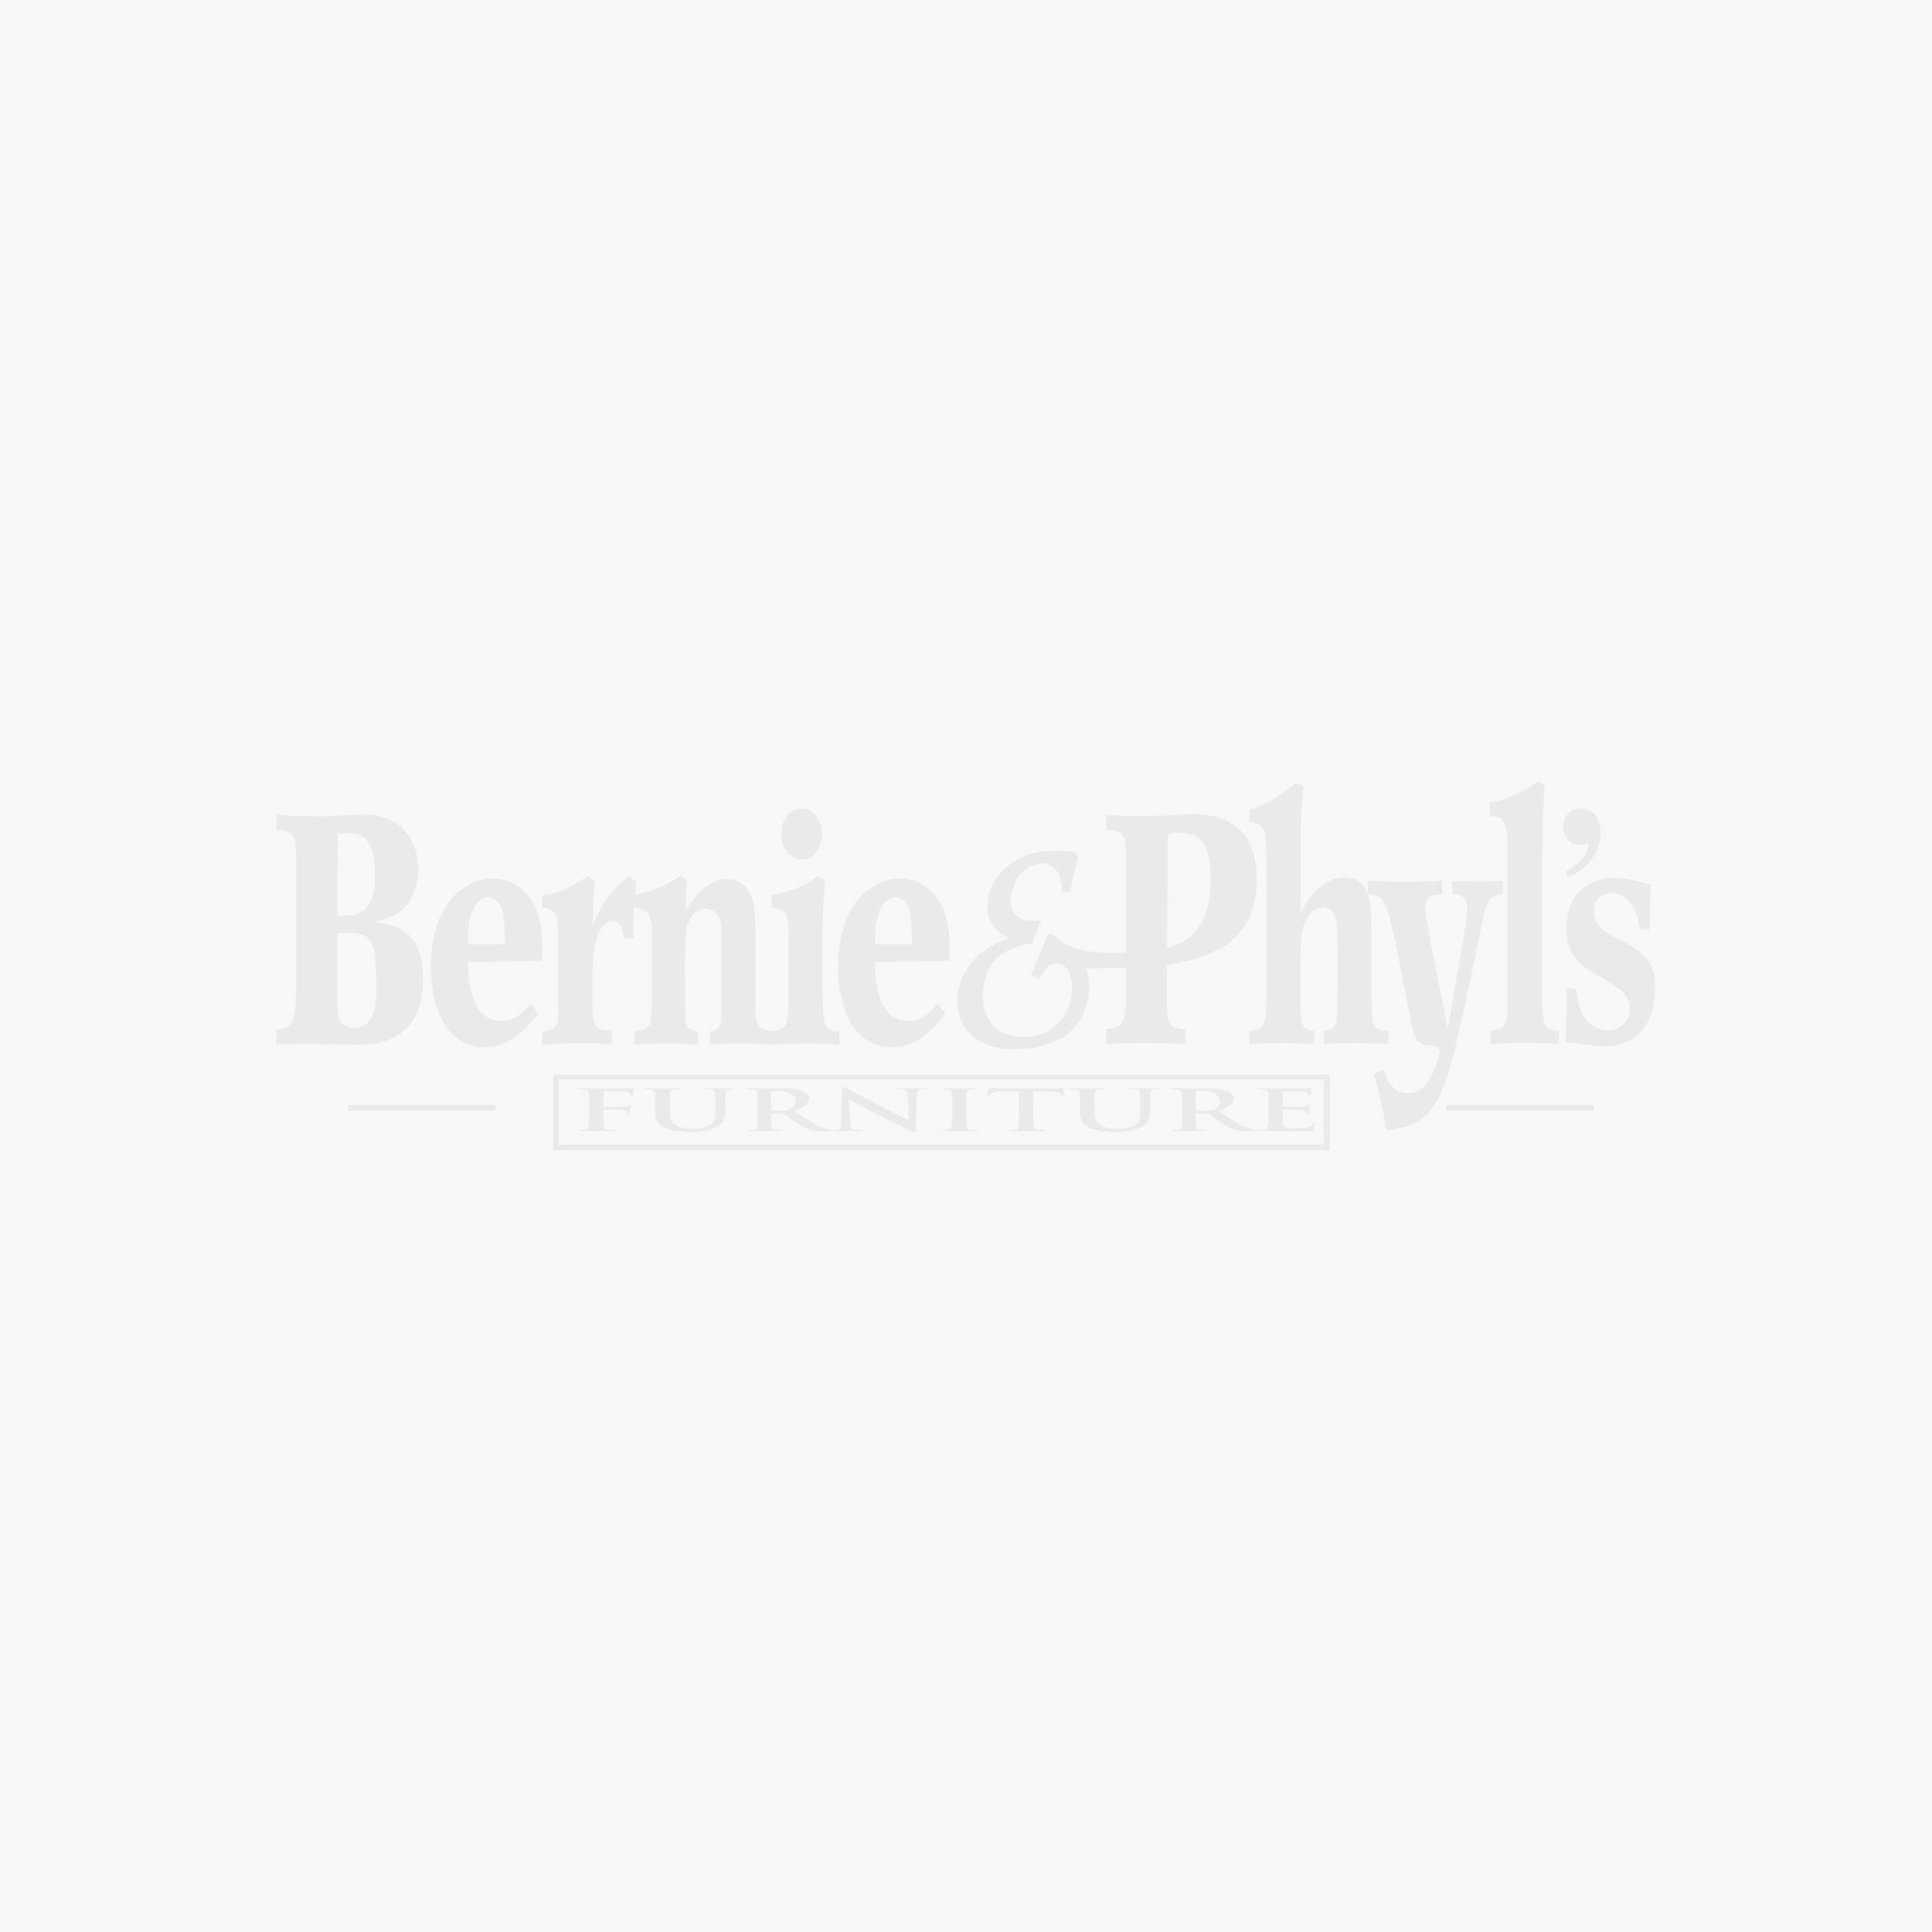 Bassett Furniture Bassett Va: Bernie & Phyl's Furniture